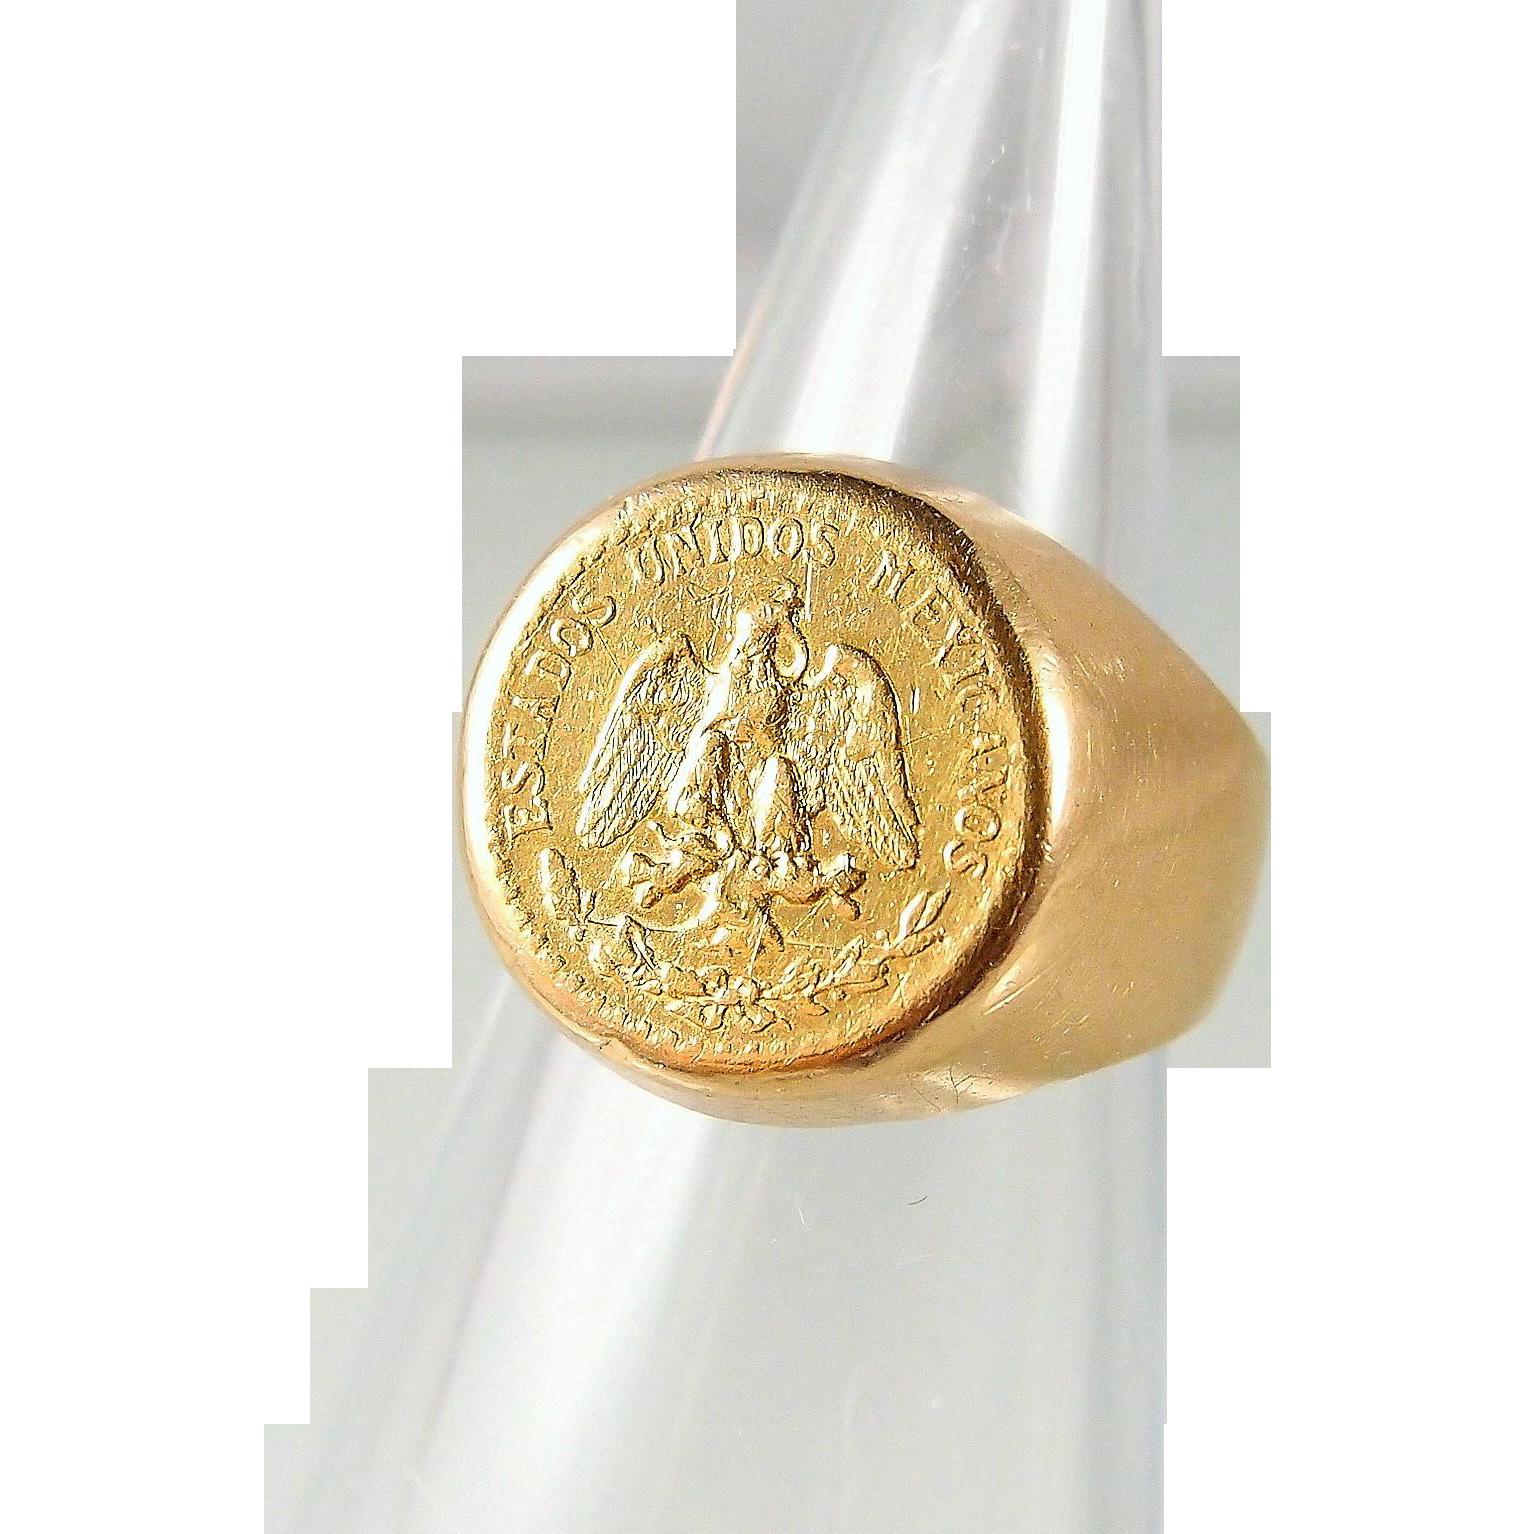 1880 5 dollar gold coin melt value